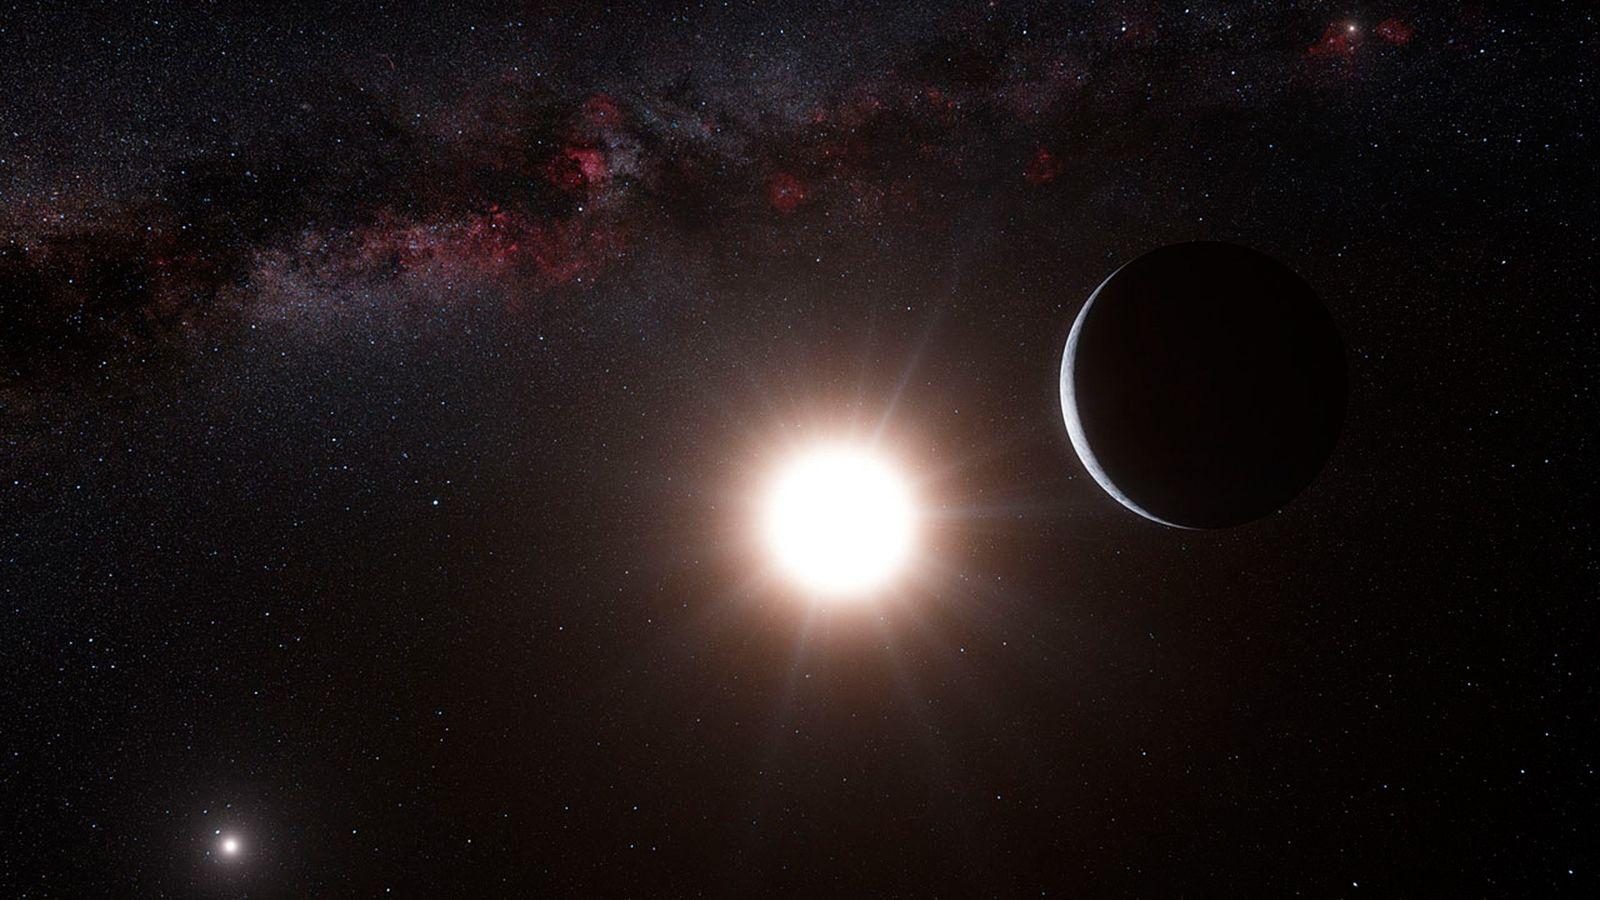 planeta-alpha-centauri-bb-desaperece